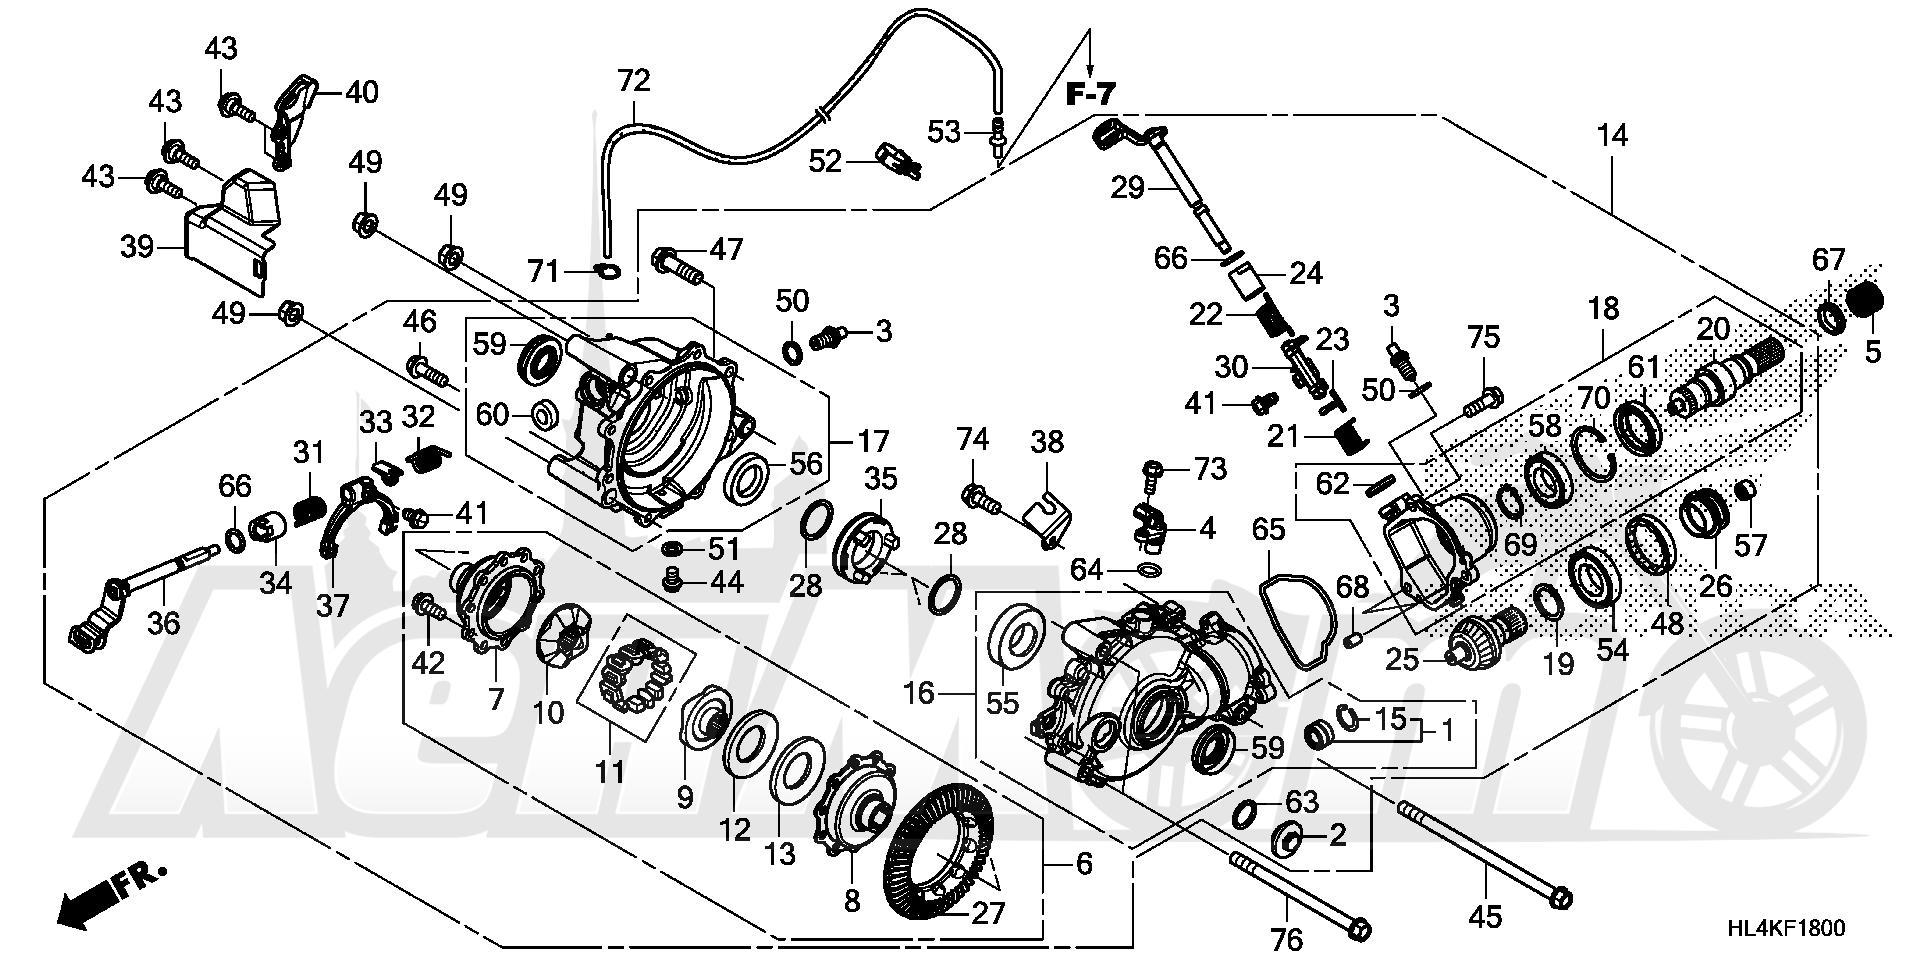 Запчасти для Квадроцикла Honda 2019 SXS1000M3P Раздел: FRONT FINAL GEAR (1) | перед FINAL шестерня (1)